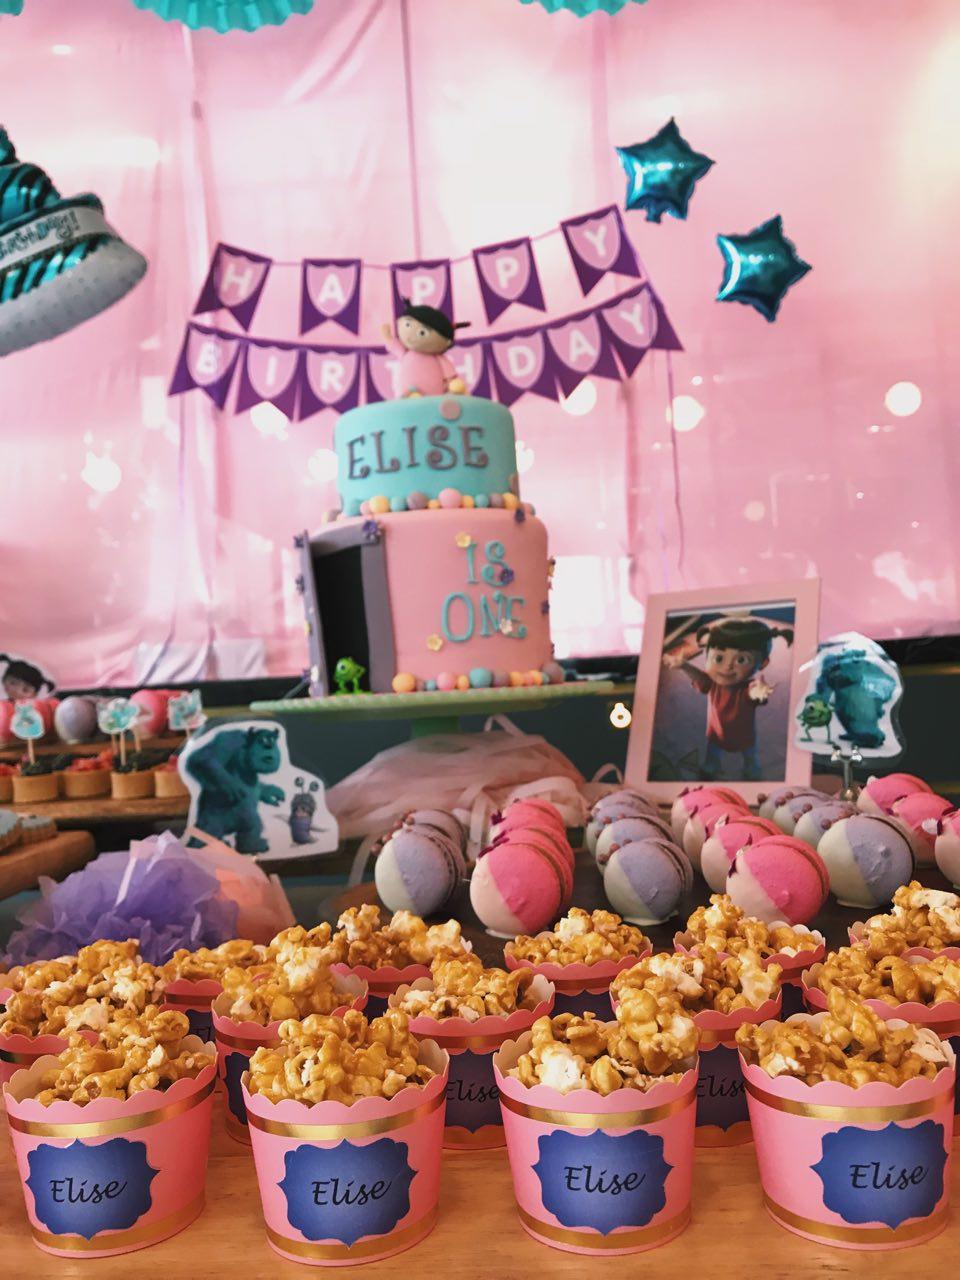 Kids-birthday-venuerific-blog-monsters-inc-cake